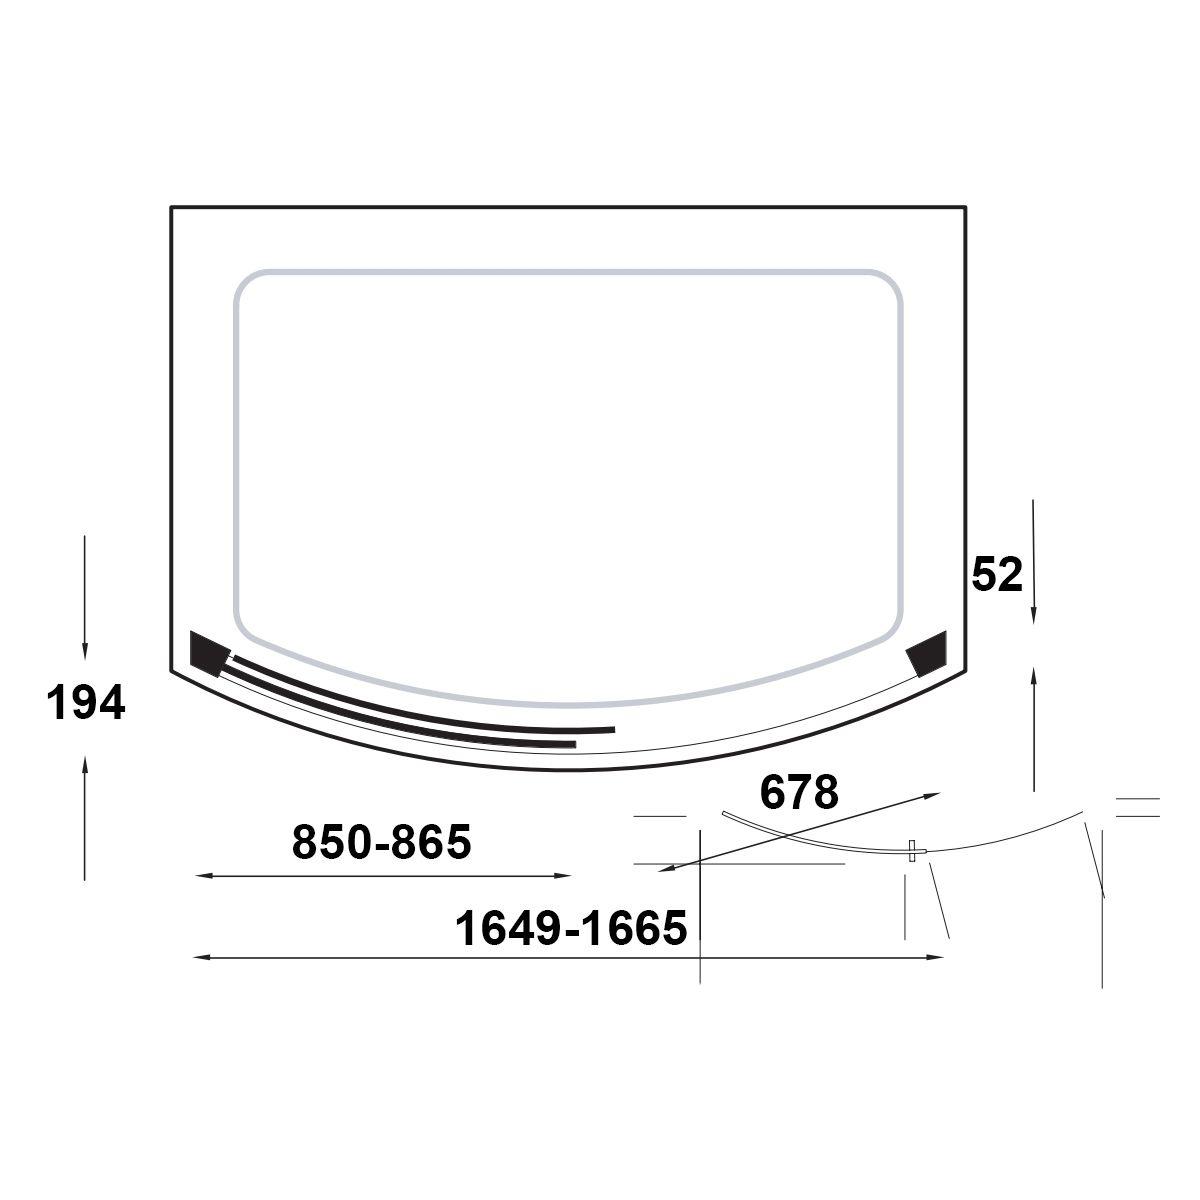 kudosoriginalbowedslidingshowerenclosure1700x700withconcept2showertraydimensions